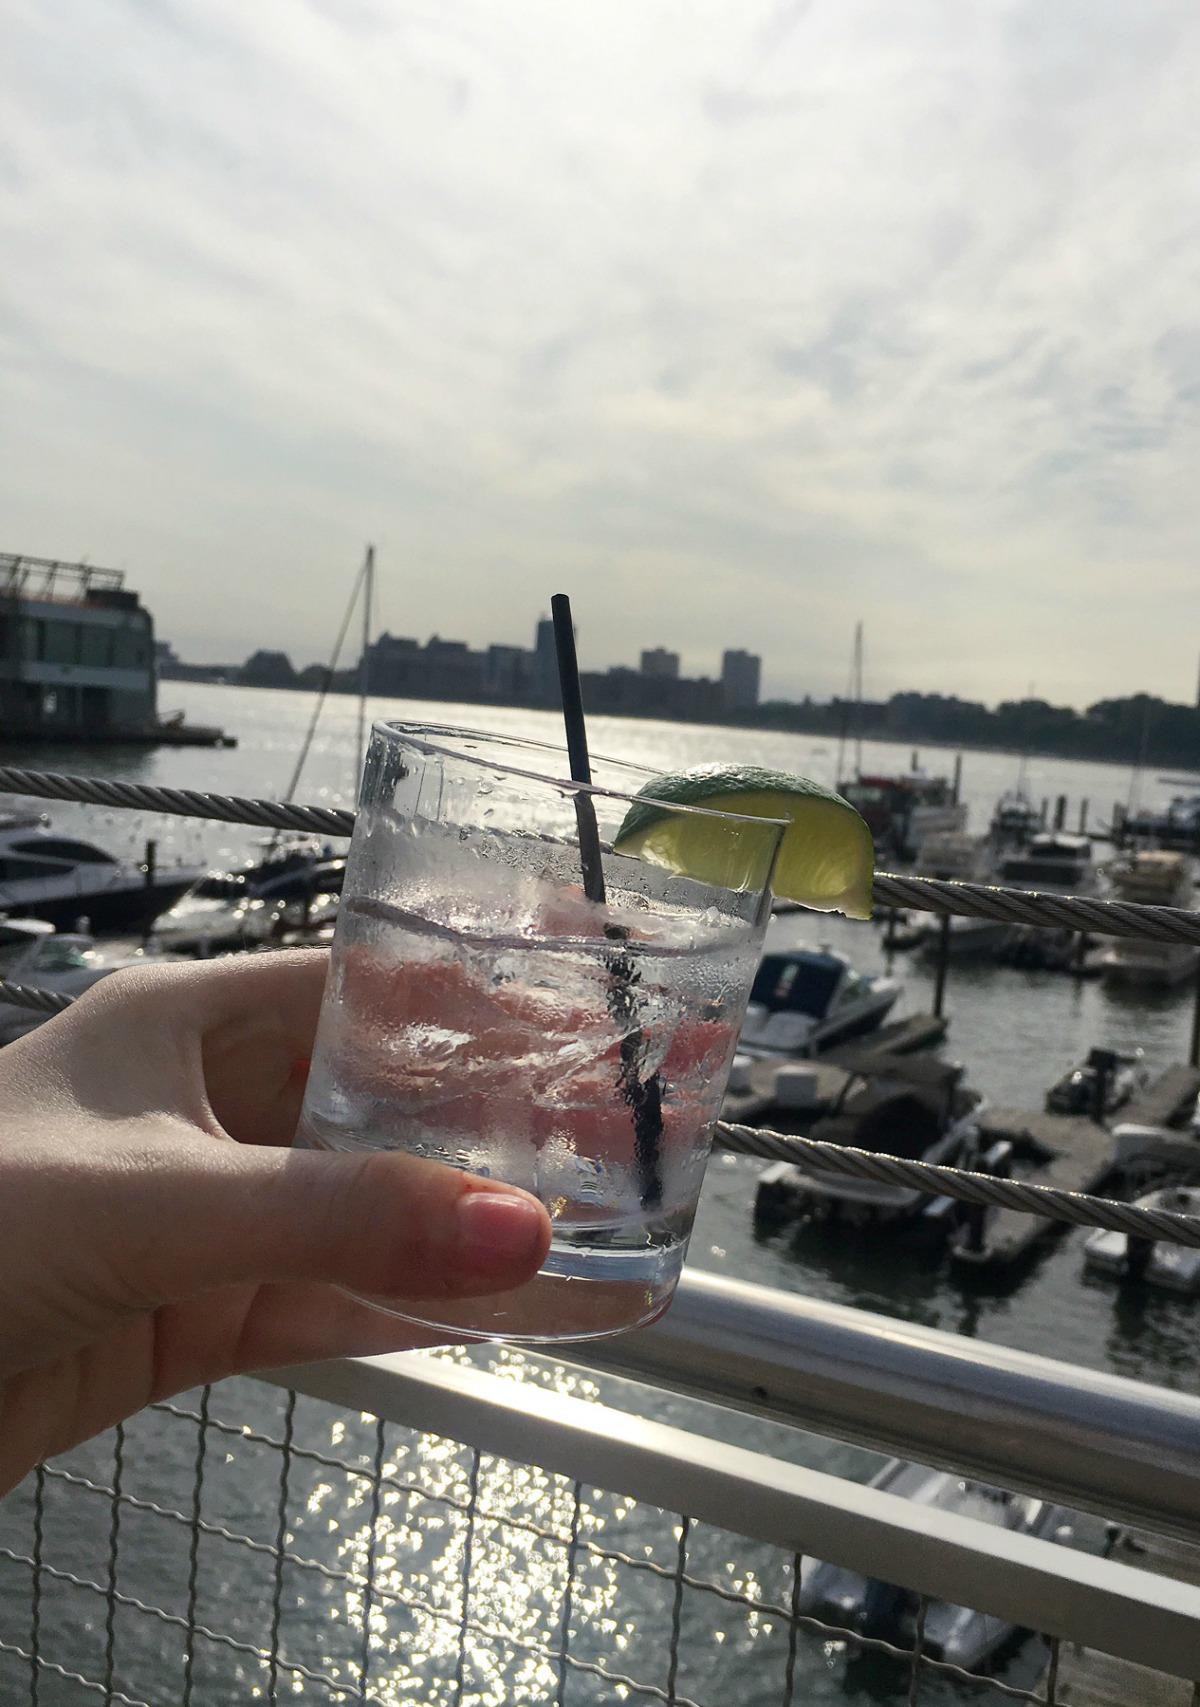 New York Fashion Week Diary : Vodka at Pier 59 Studios